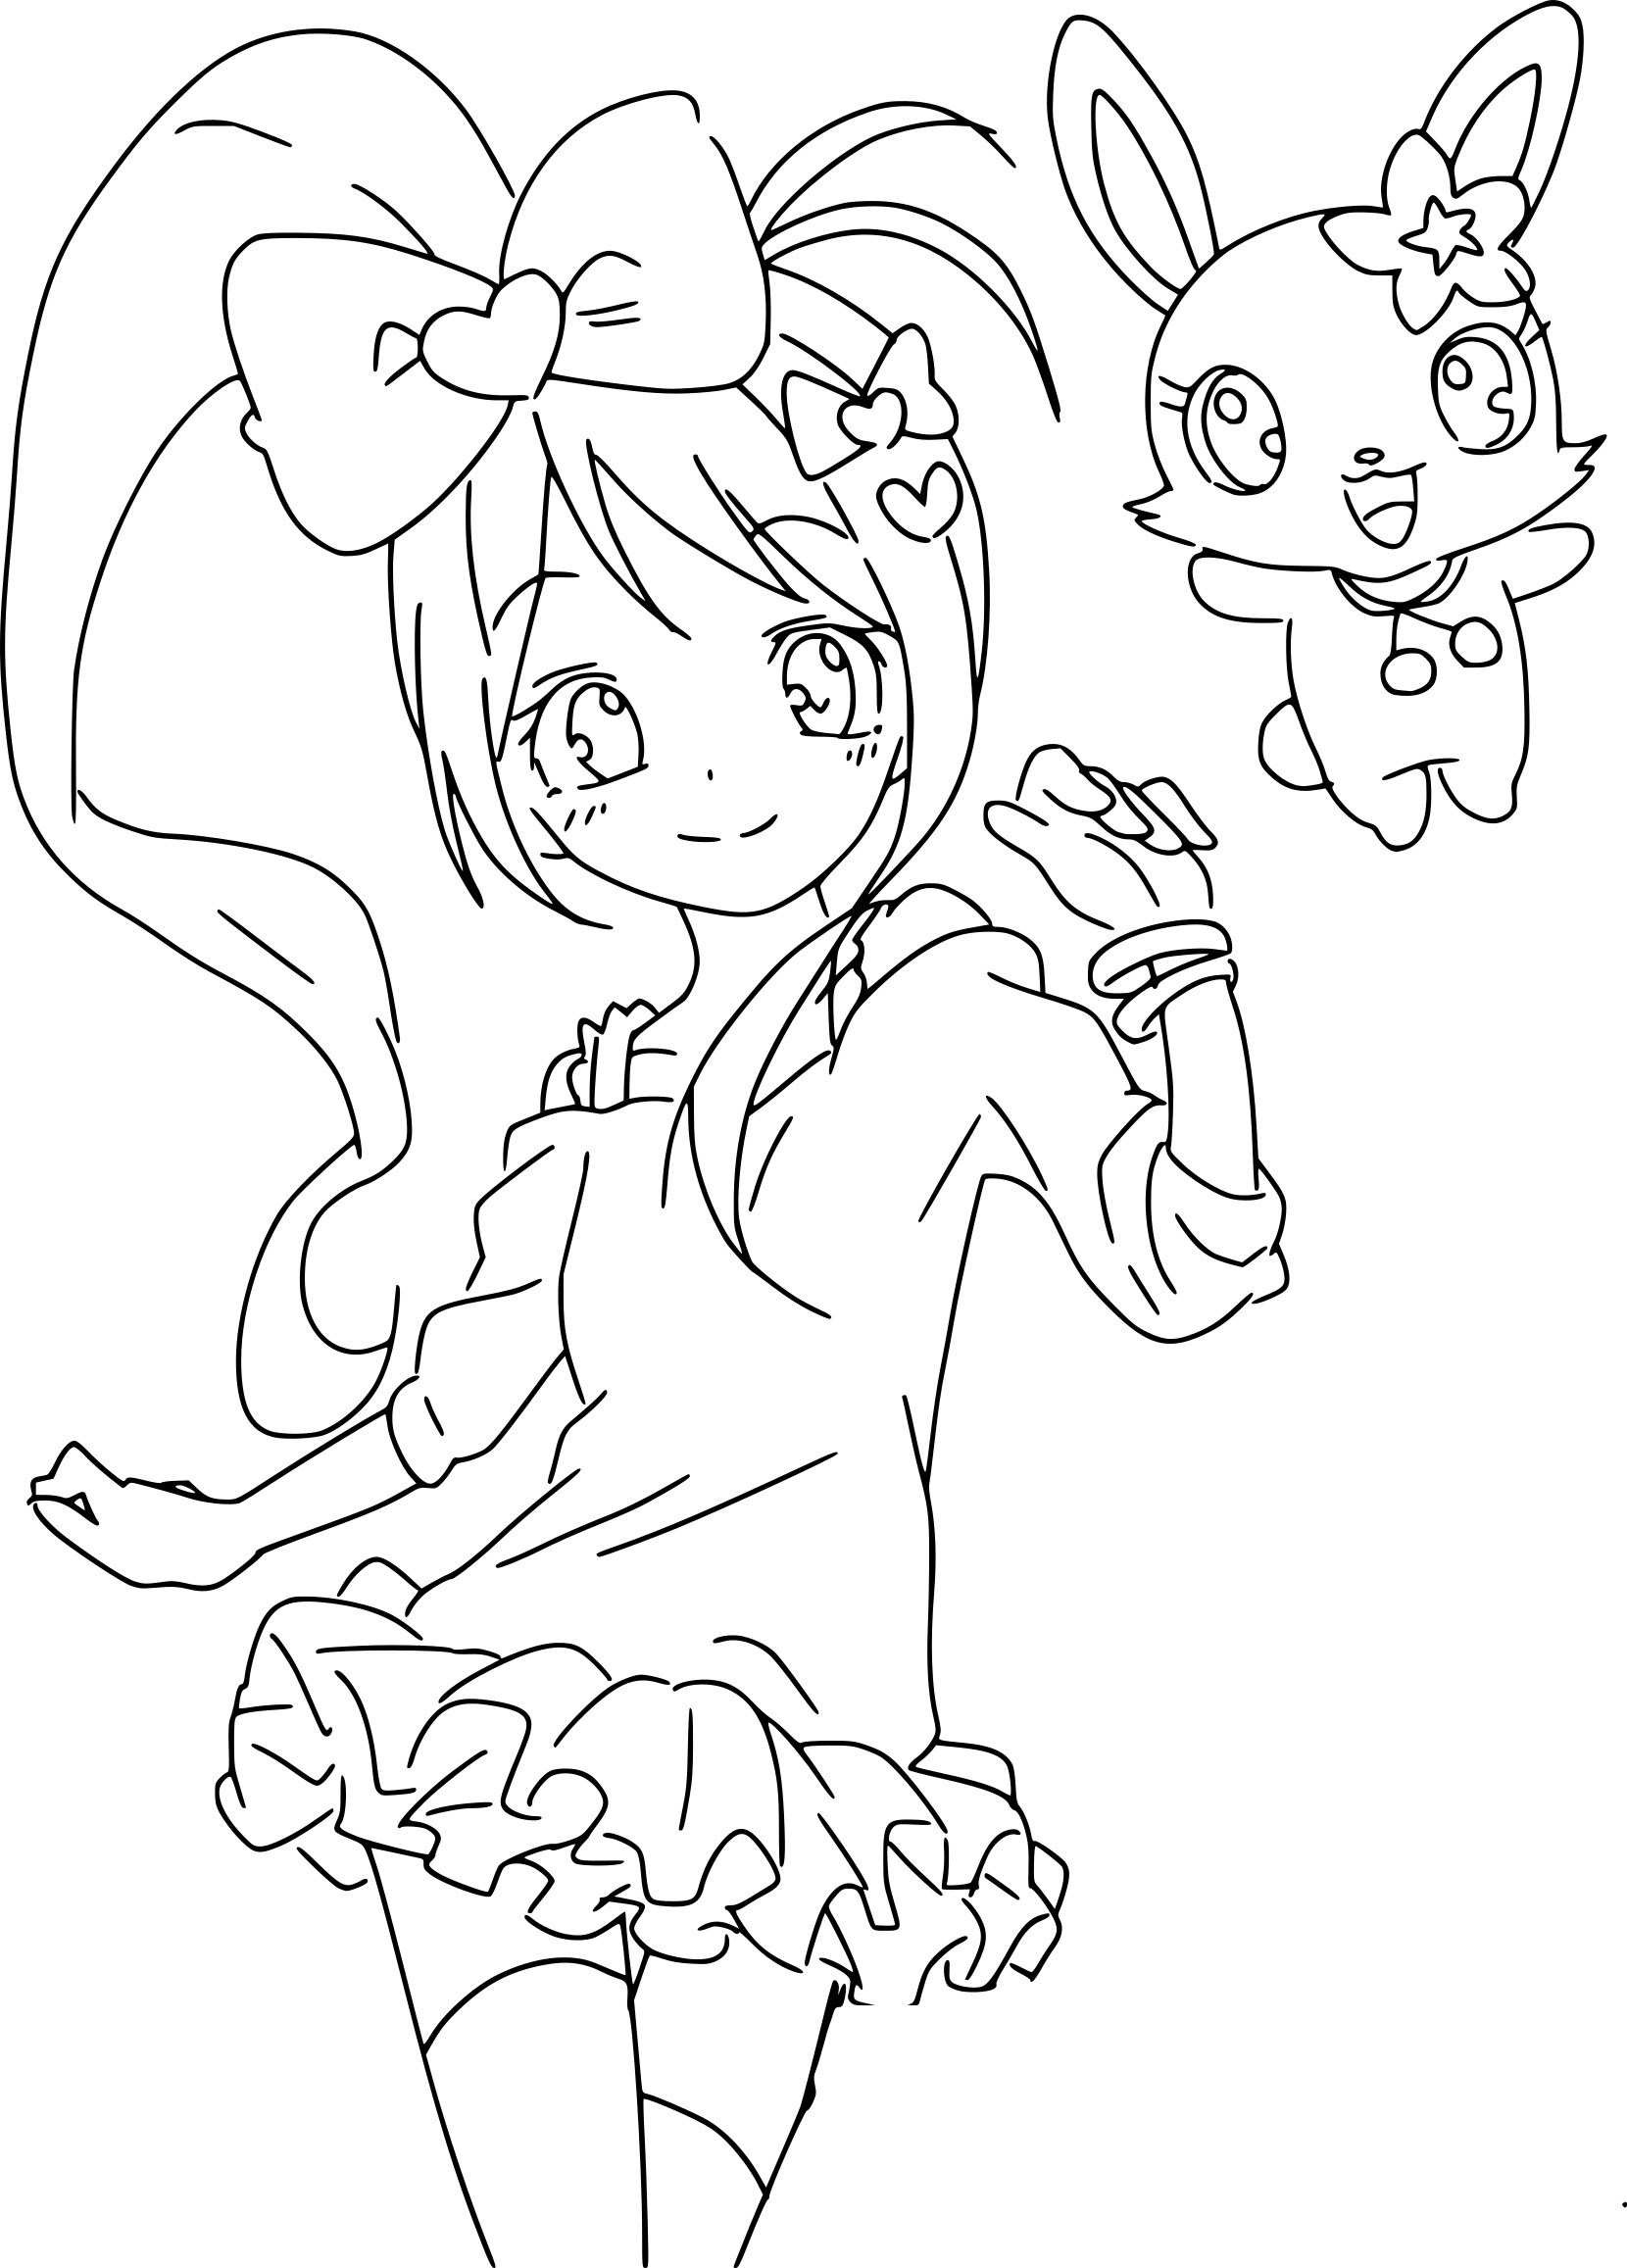 Garcon Coloriage Manga Fille Ado   Novocom.top